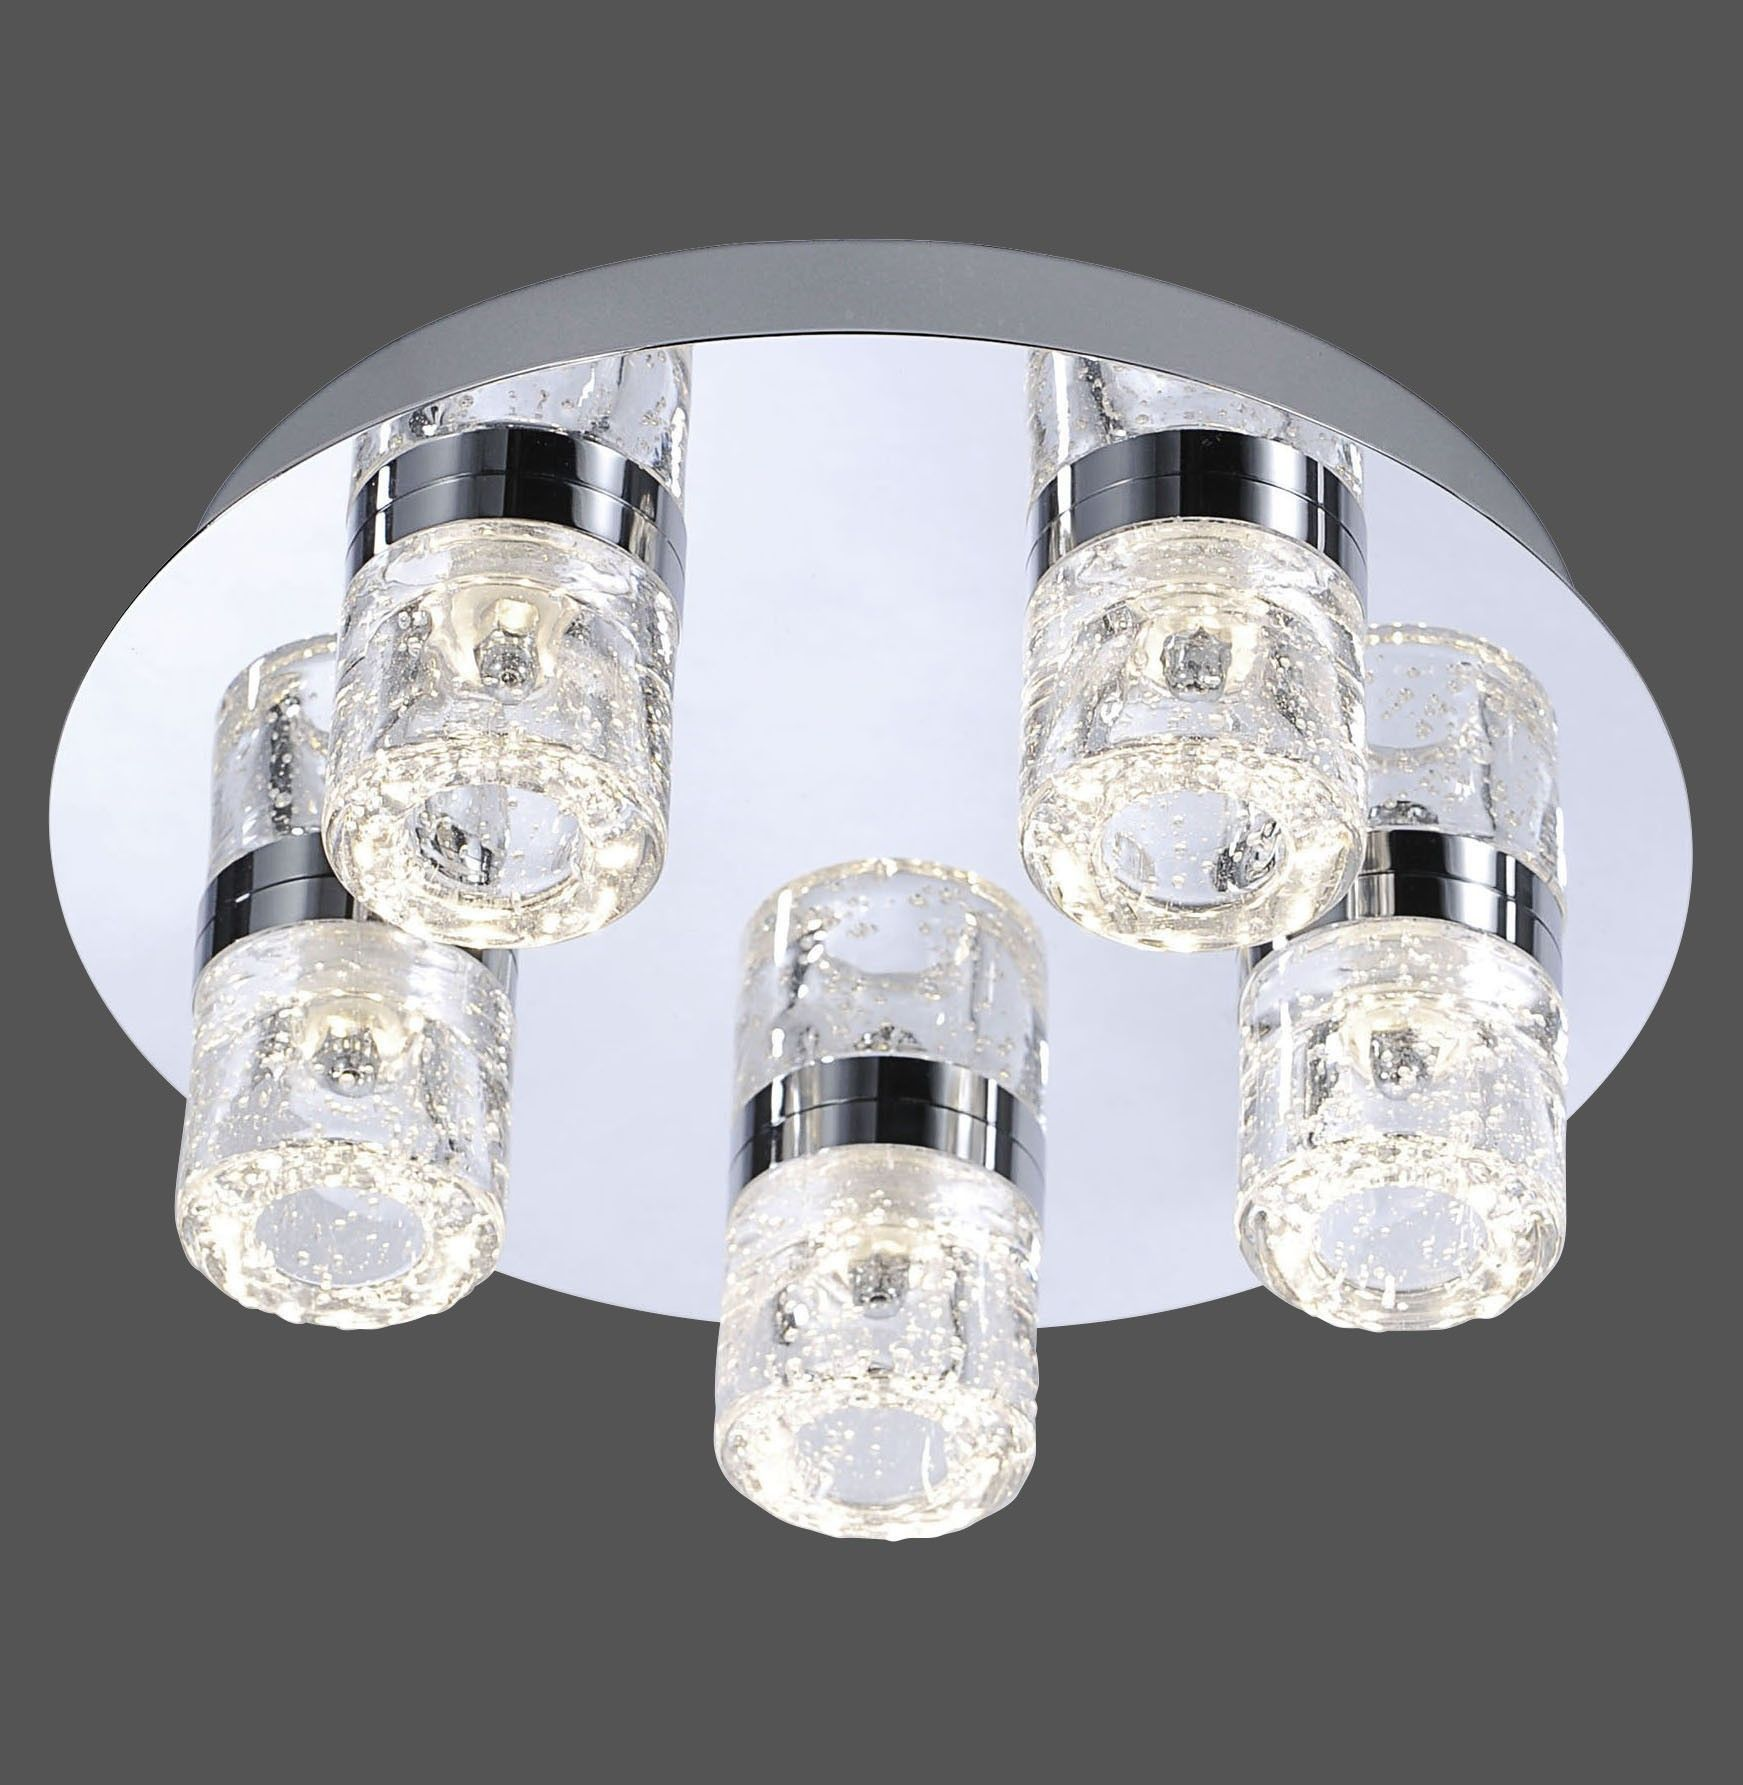 Led Deckenleuchte Deckenleuchten Leuchtenart Bathroom Lighting Led Ceiling Spotlights Led Lights